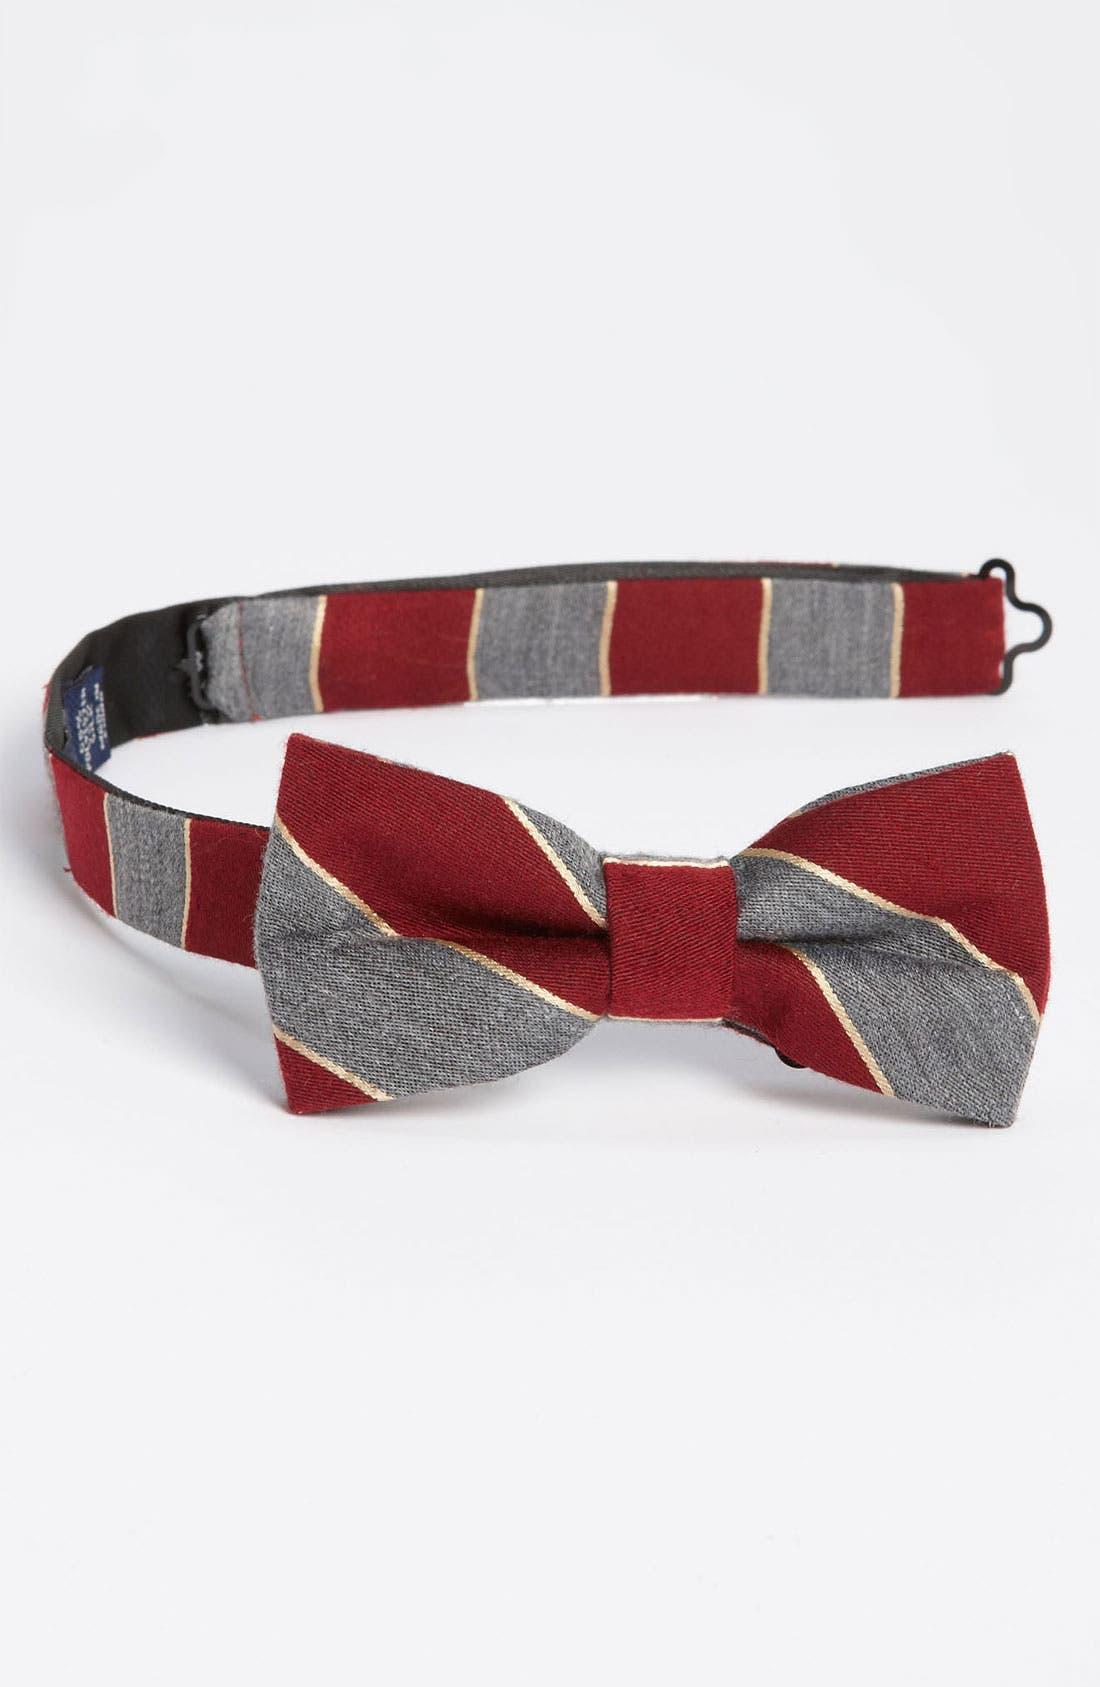 Main Image - 1901 Bow Tie